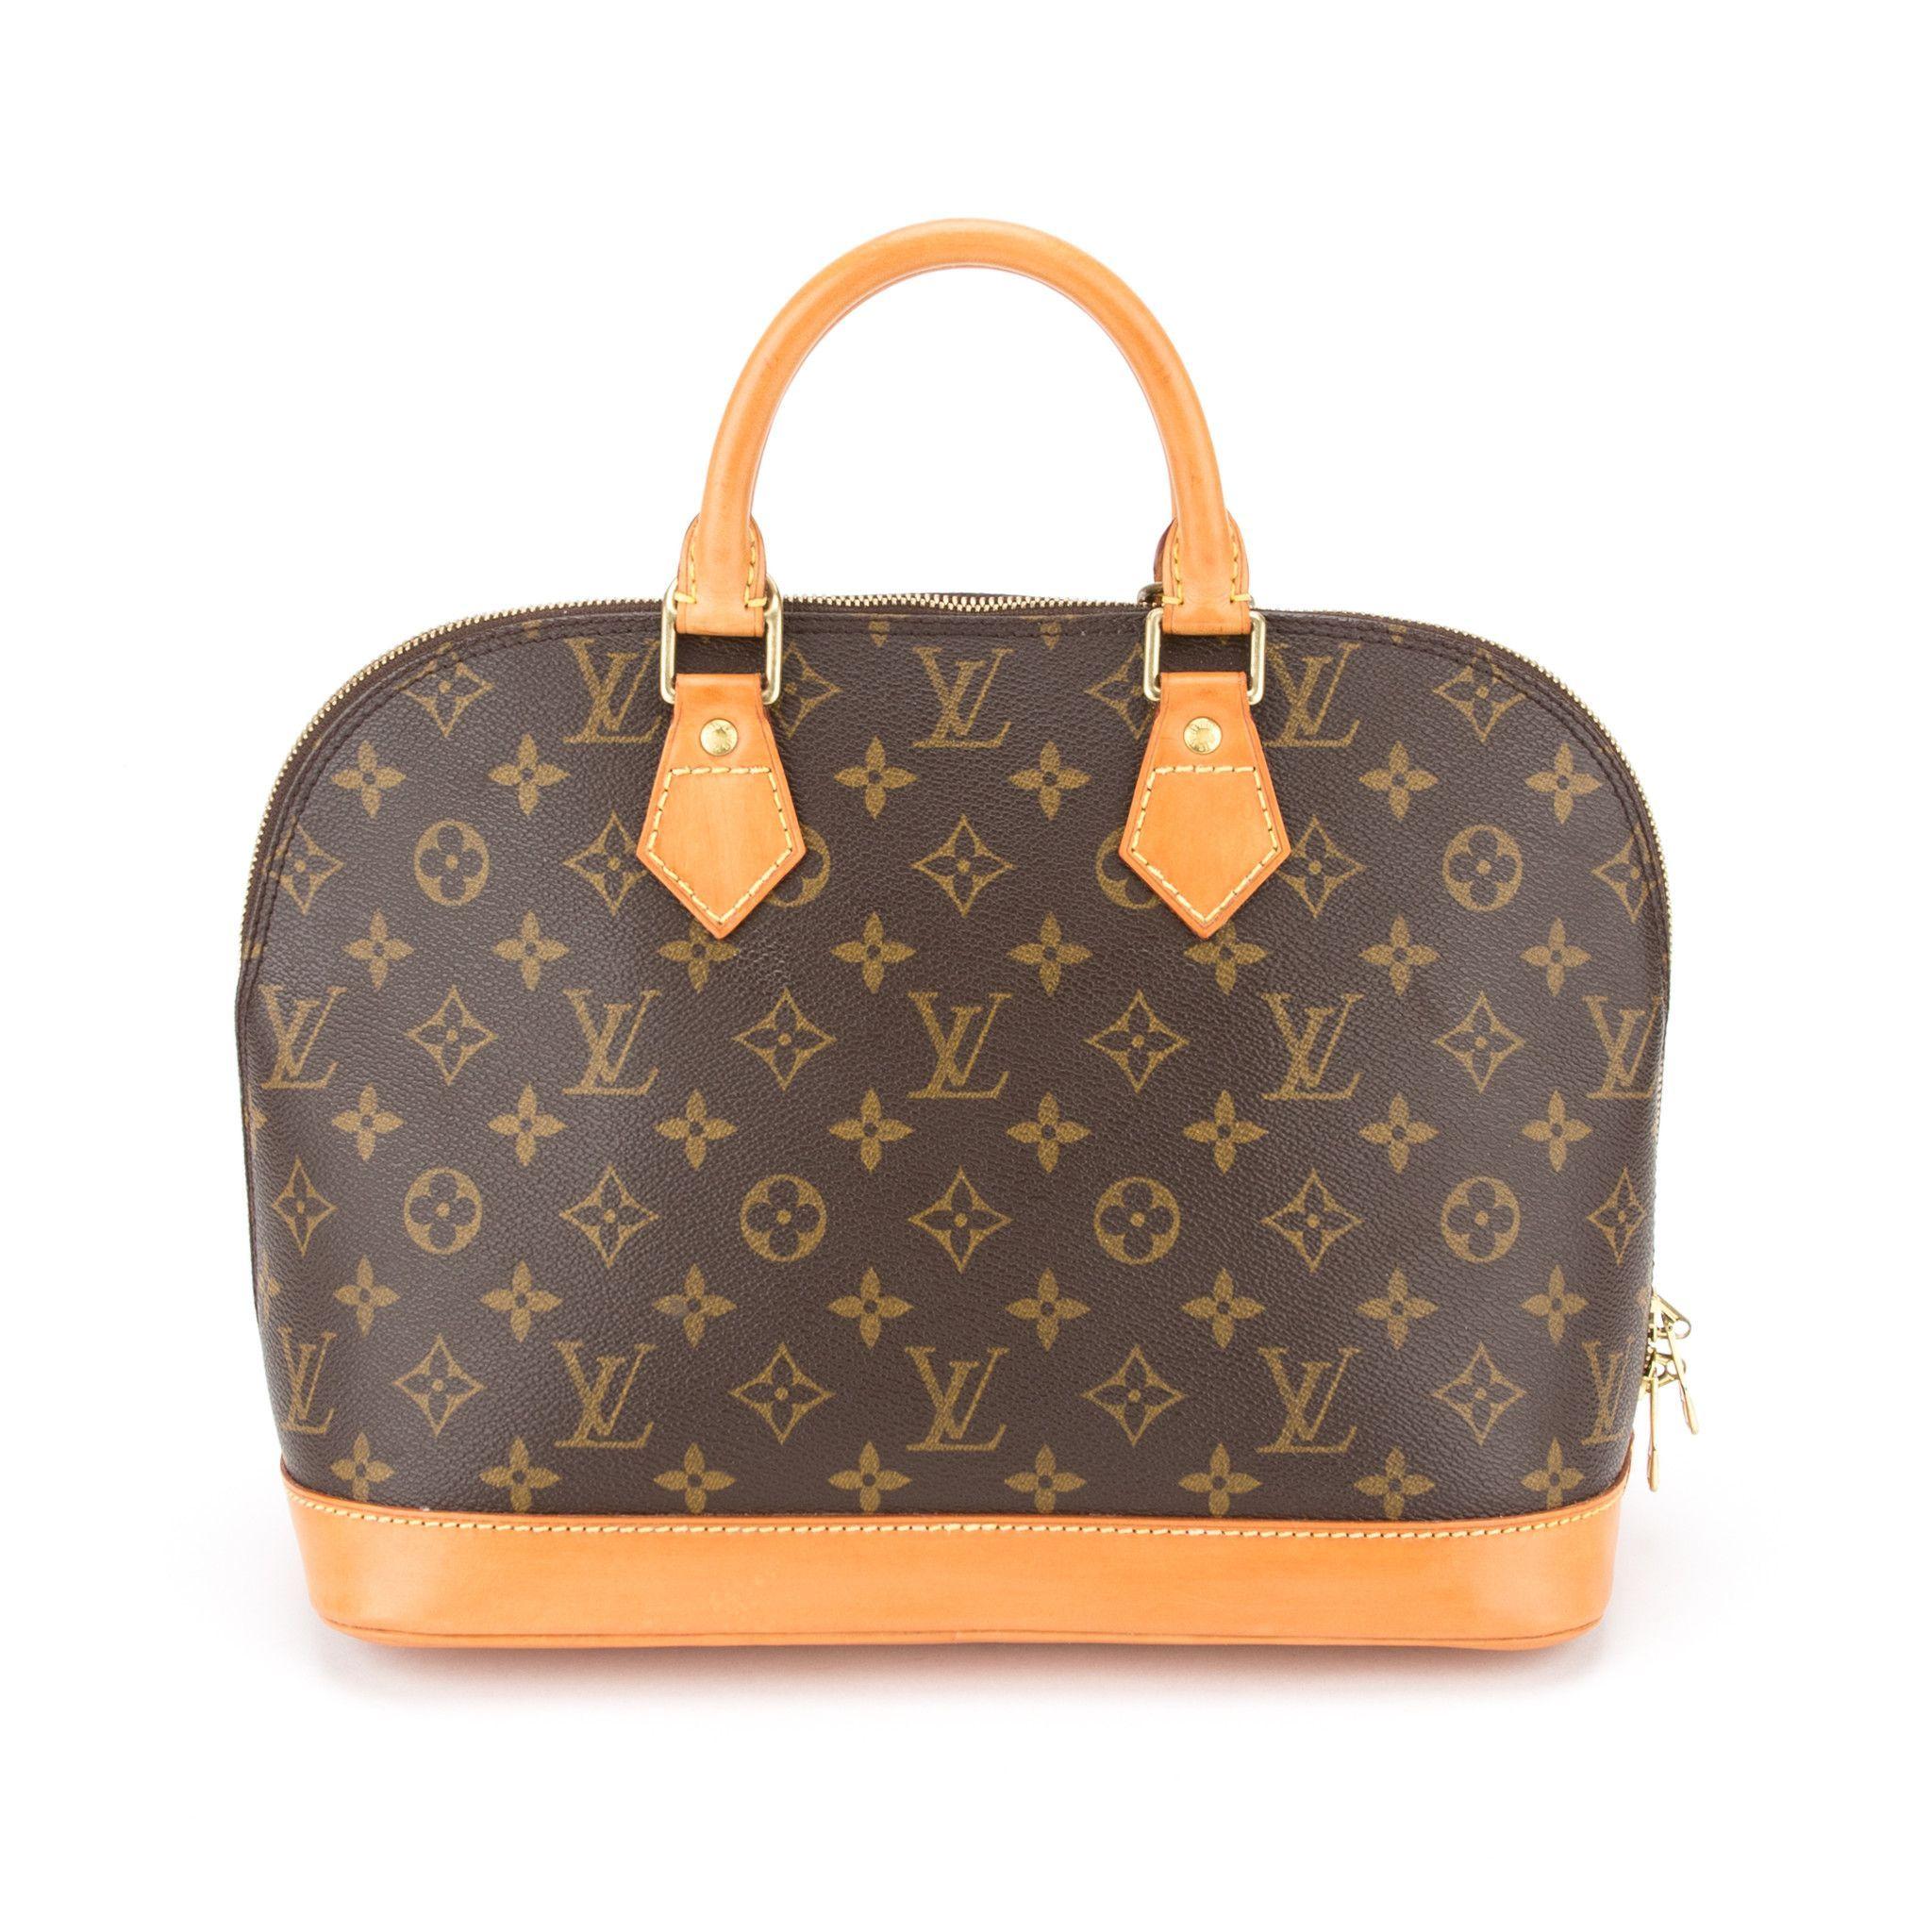 Louis Vuitton Monogram Alma Authentic Pre Owned